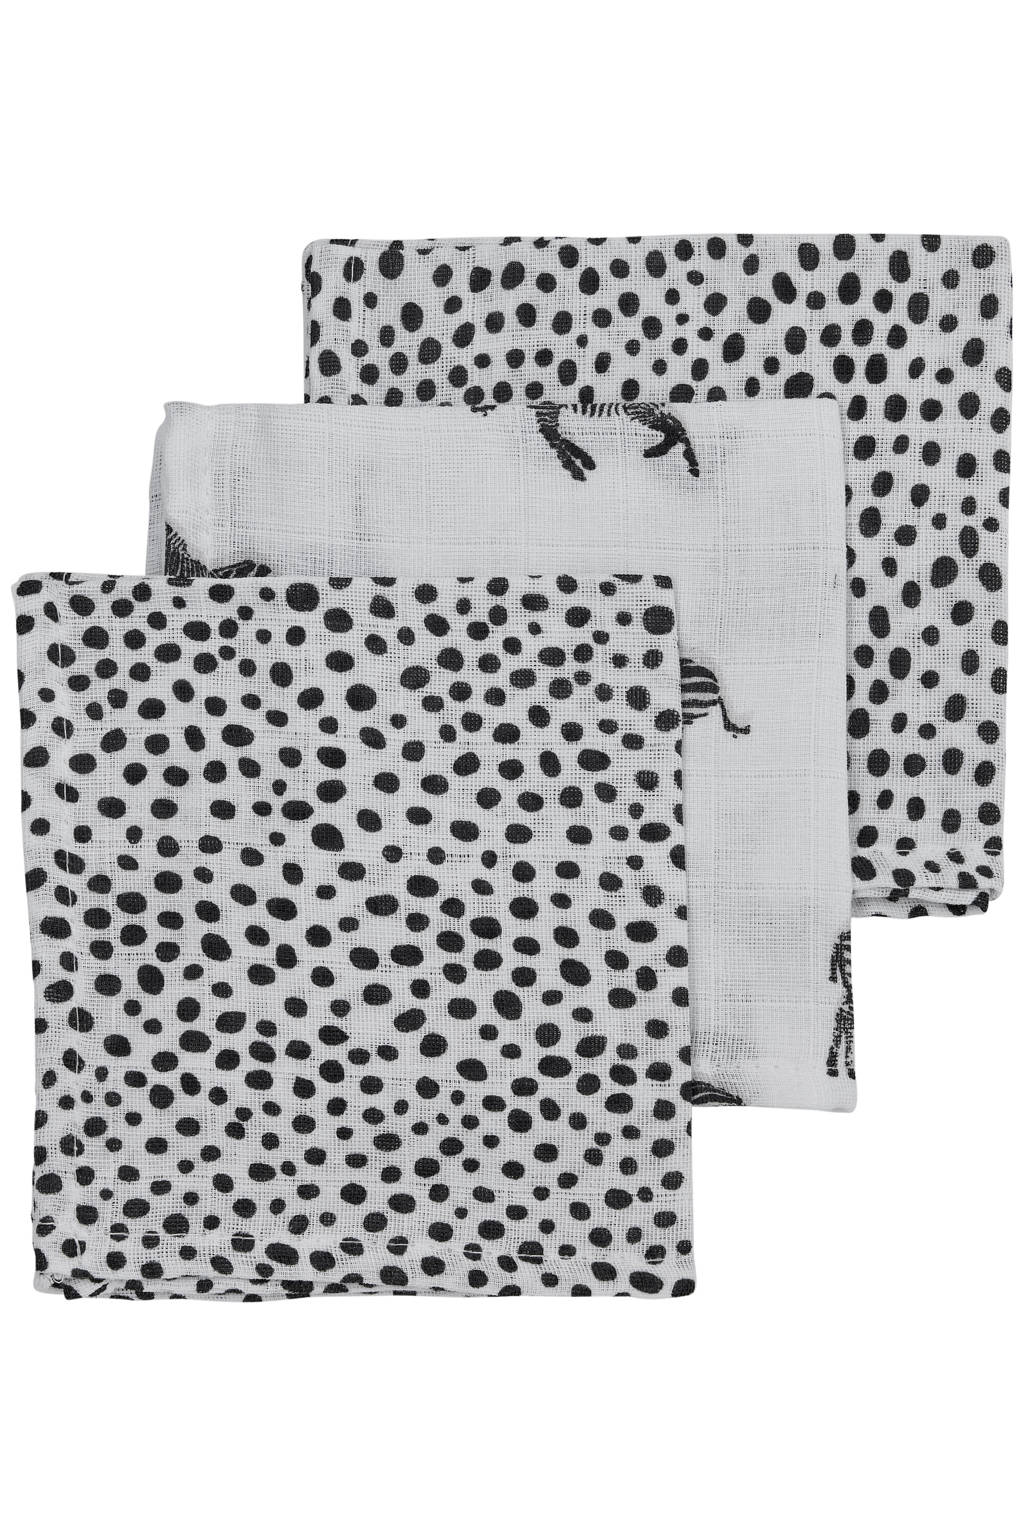 Meyco hydrofiel monddoekje - set van 3 Zebra/Cheetah 30x30 cm wit/zwart, Wit/zwart